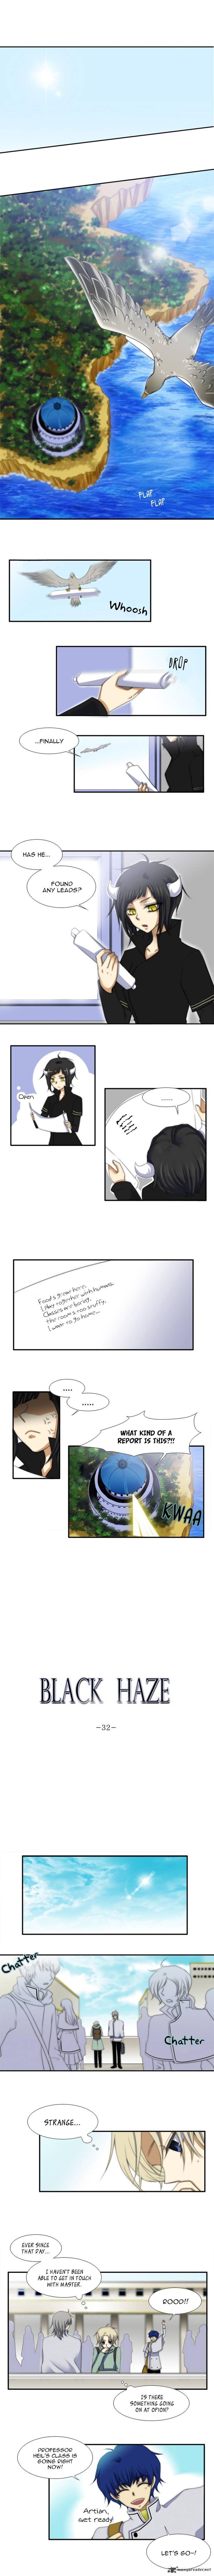 Black Haze 32 Page 2